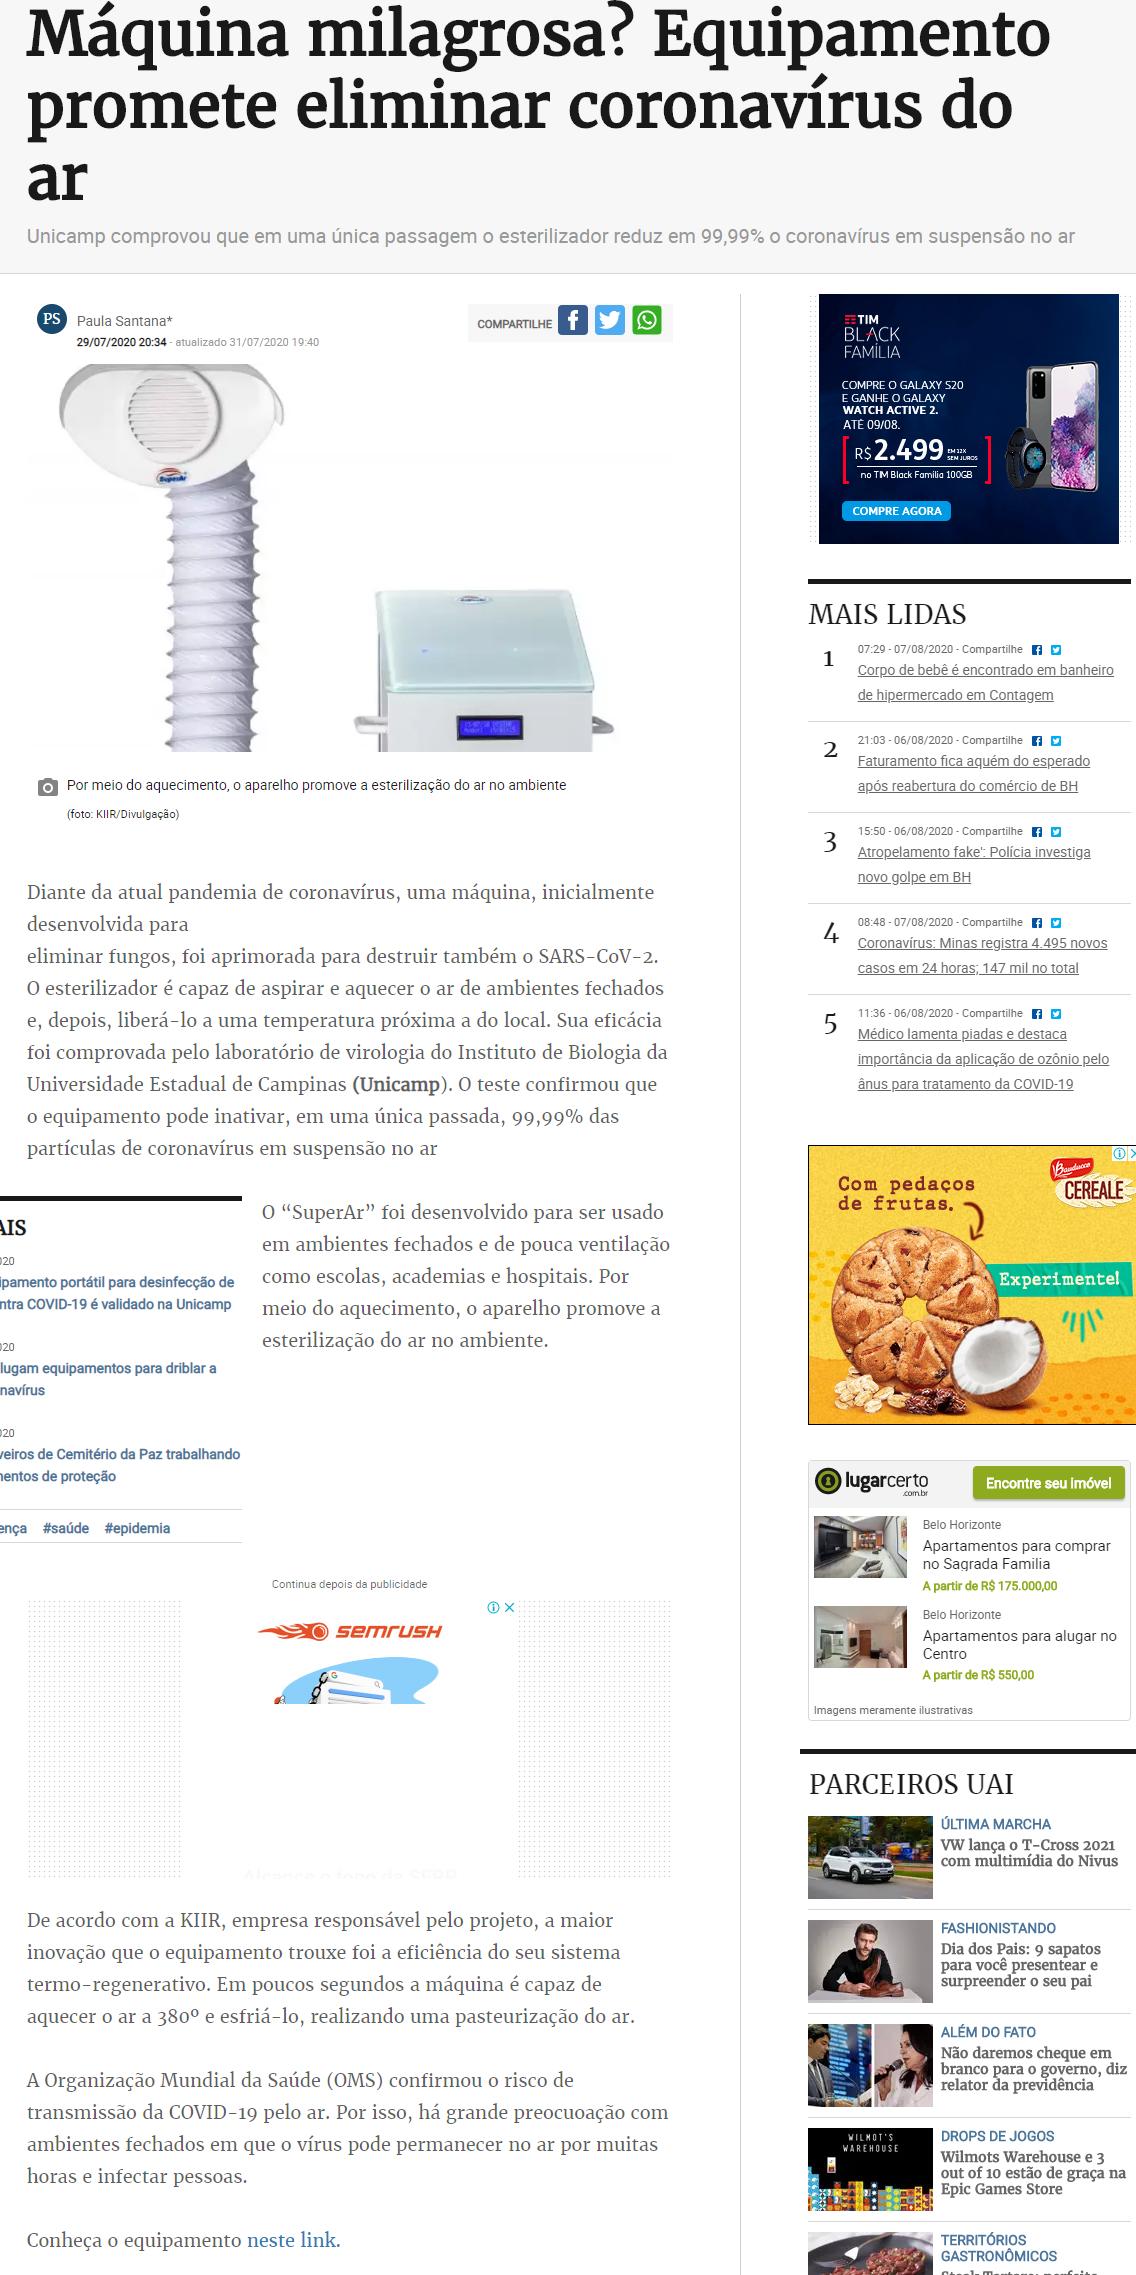 Máquina milagrosa? Equipamento promete eliminar coronavírus do ar - Estado de Minas